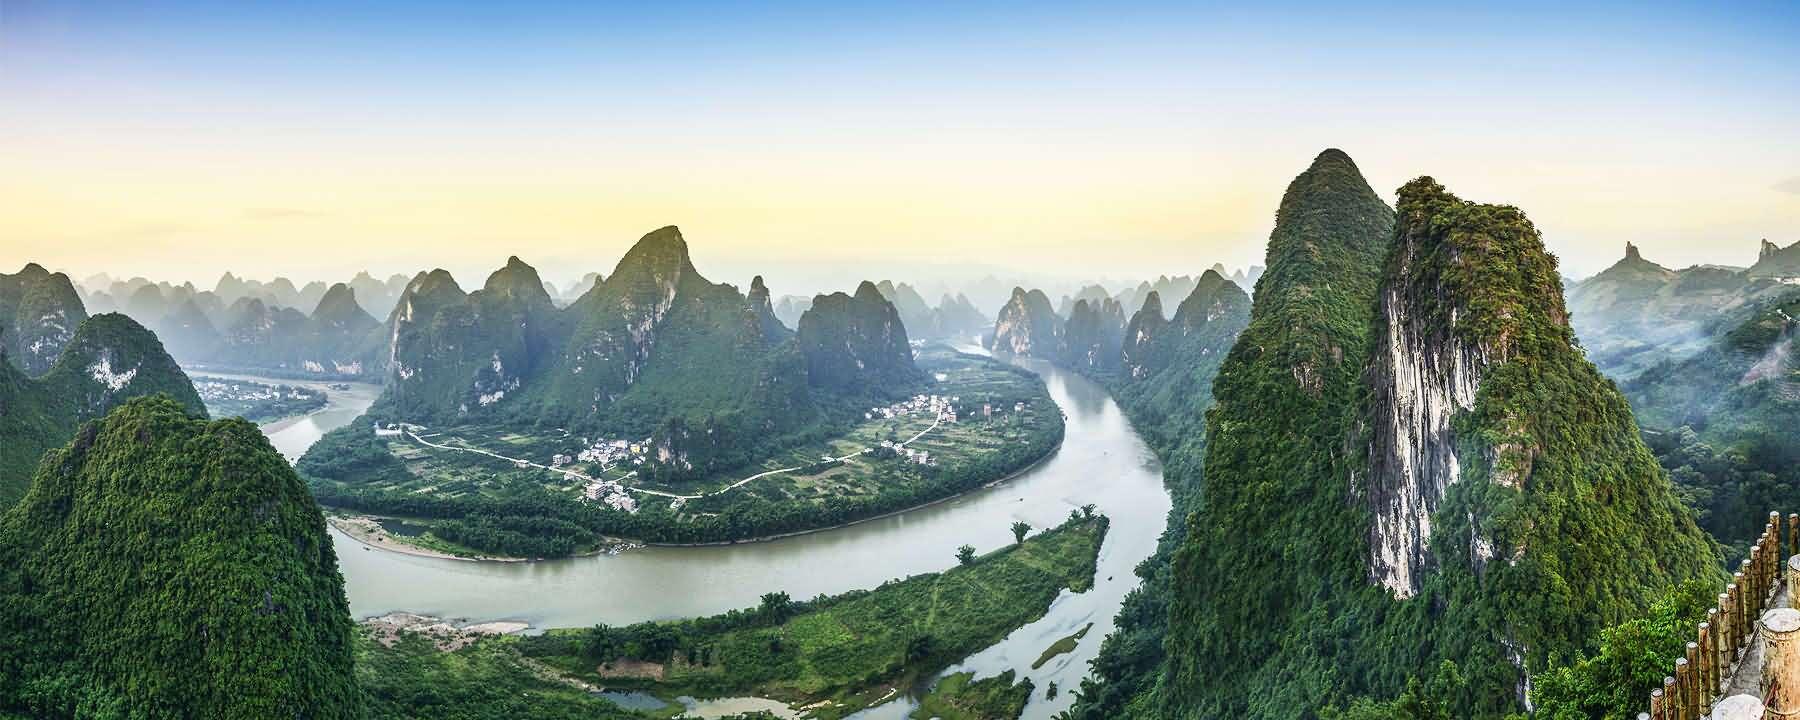 Top Ten China Tours